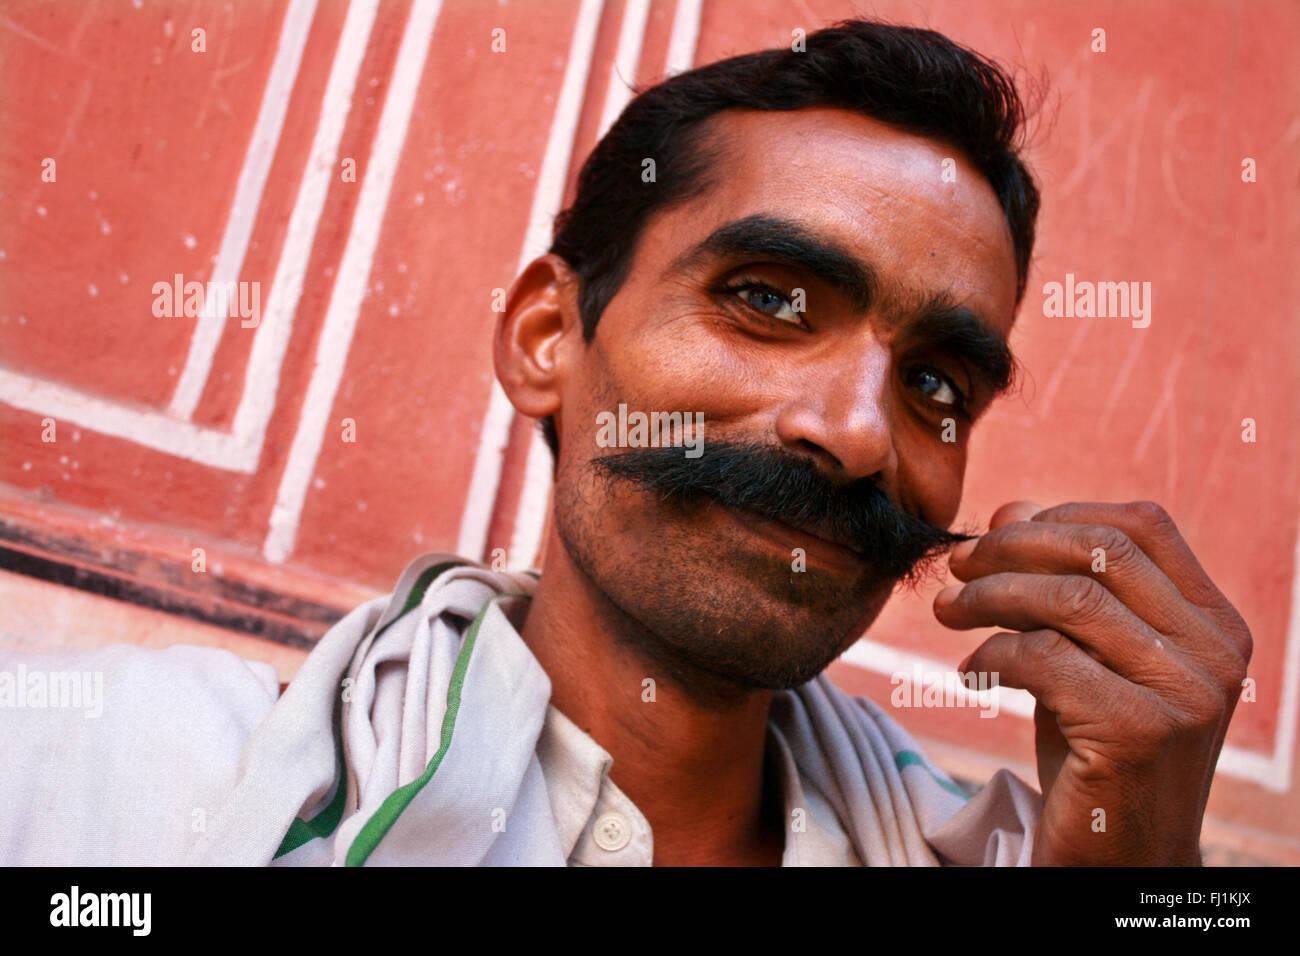 Rajasthani uomo con i baffi , Jaipur, India Immagini Stock